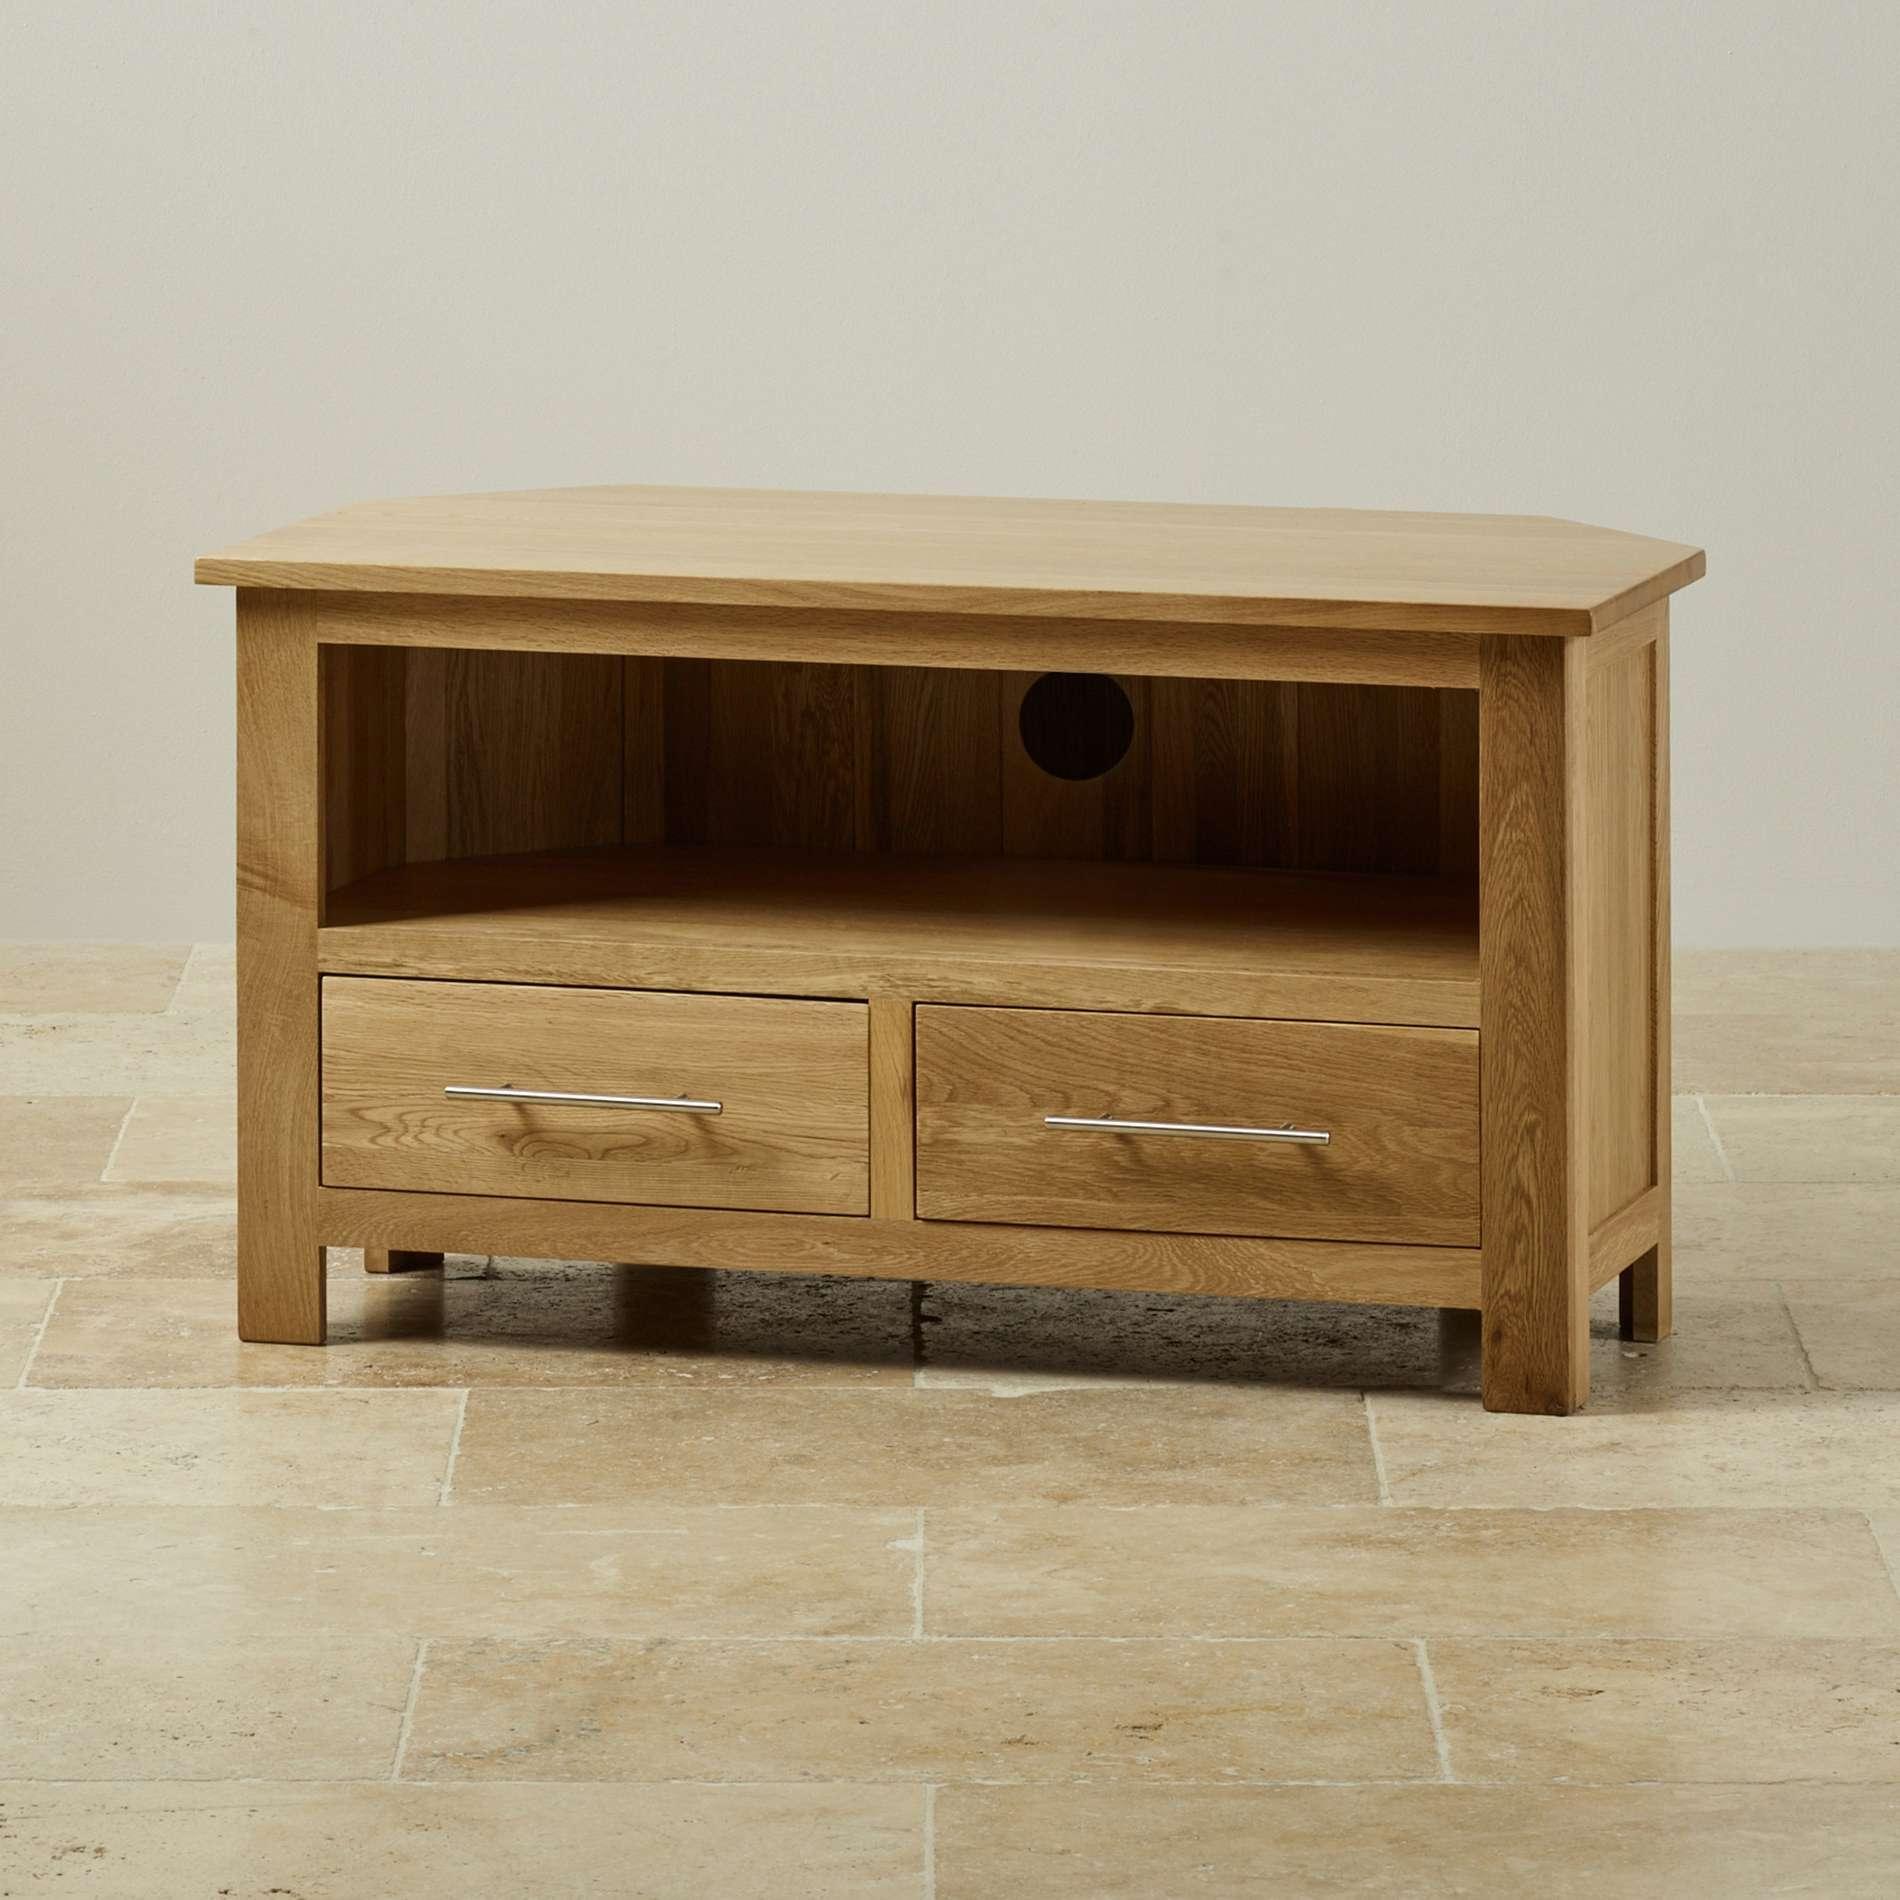 Tv Cabinets | Mango, Painted & Oak Tv Units | Oak Furniture Land Throughout Light Oak Corner Tv Cabinets (View 15 of 20)